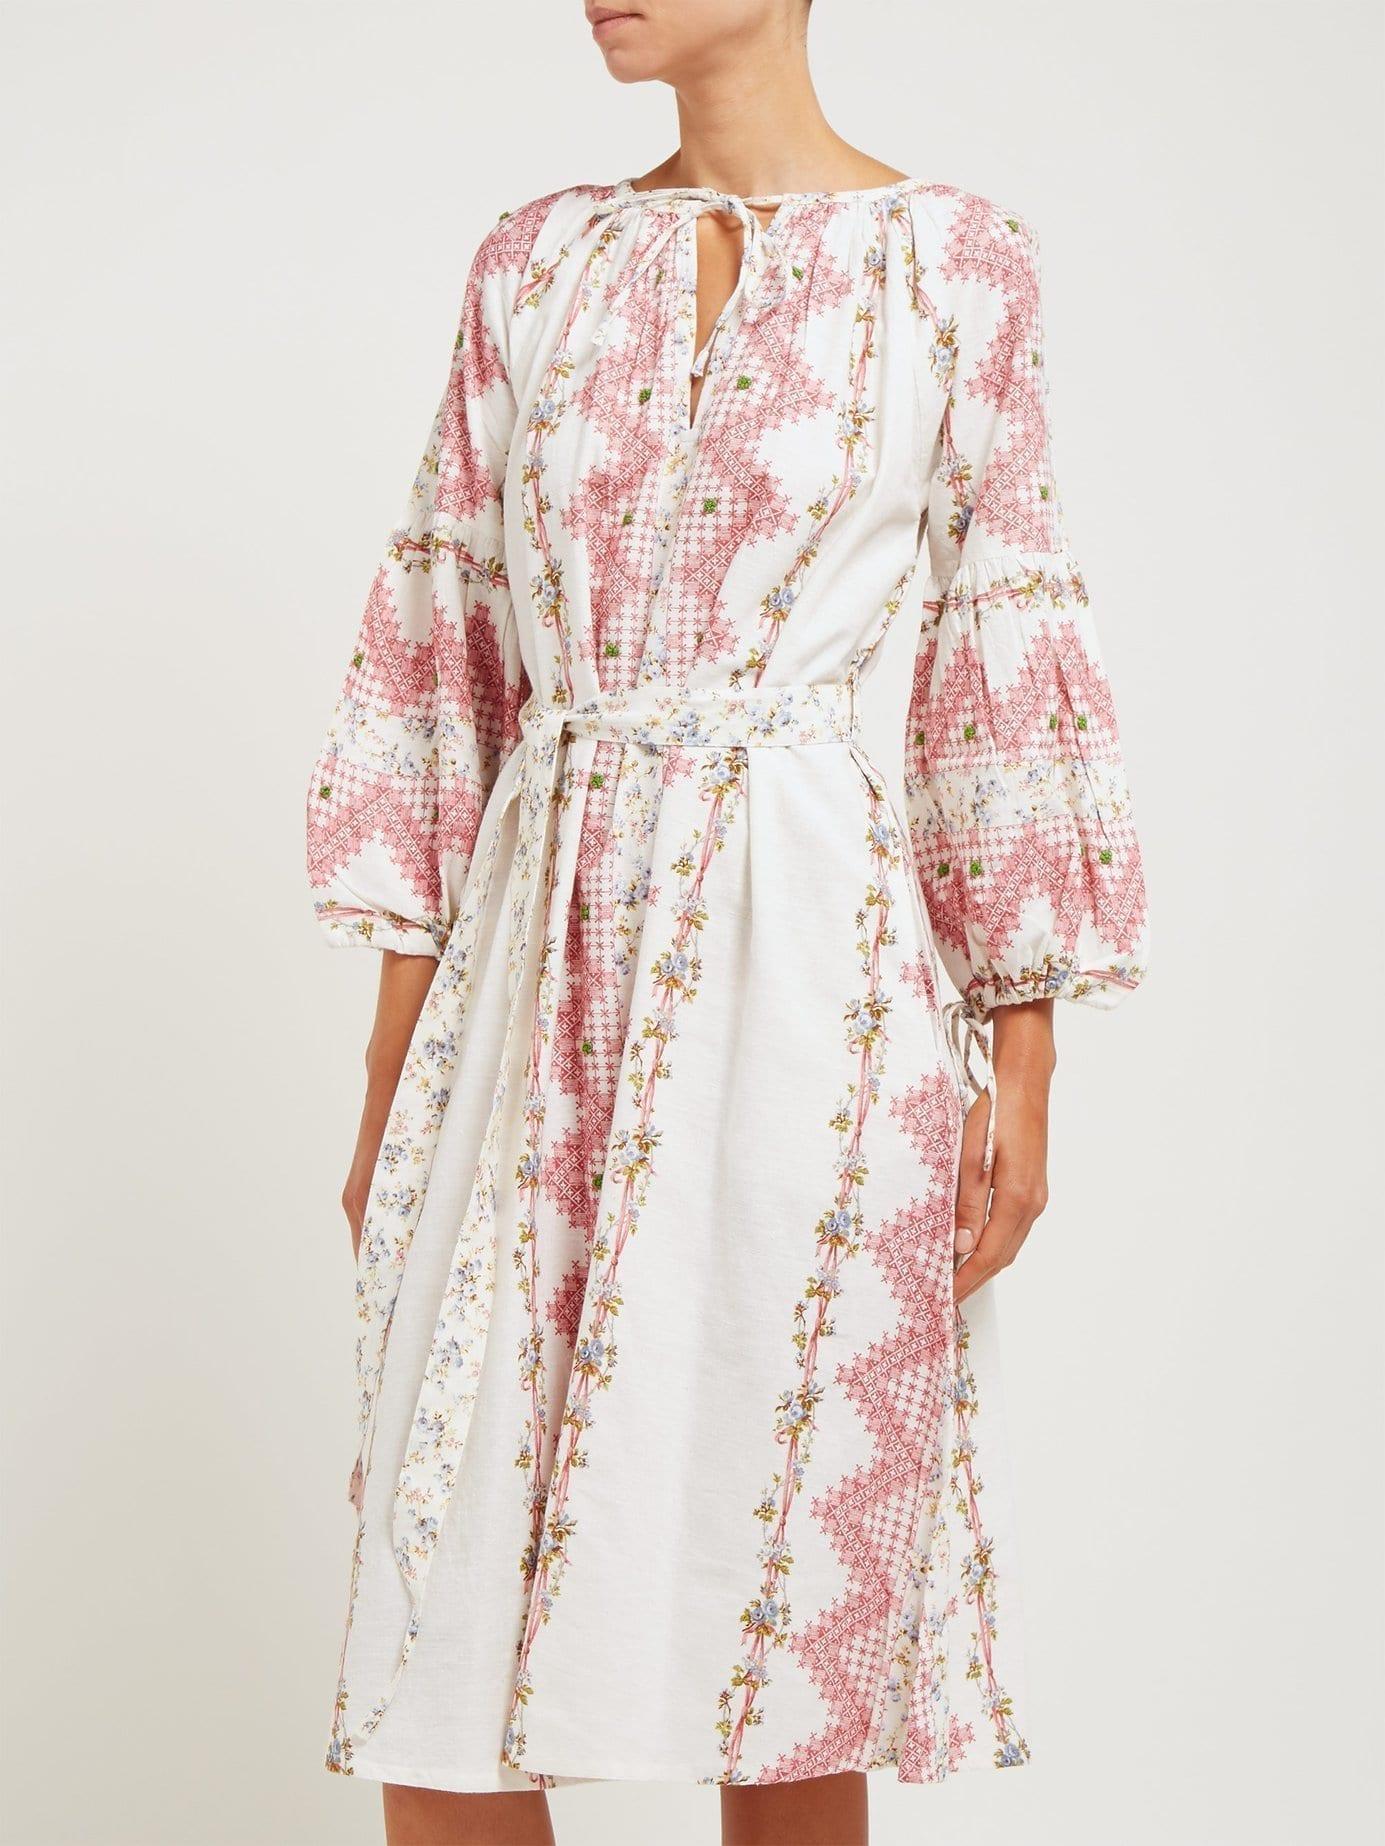 D'ASCOLI Tidewater Floral Print Cotton Red Dress